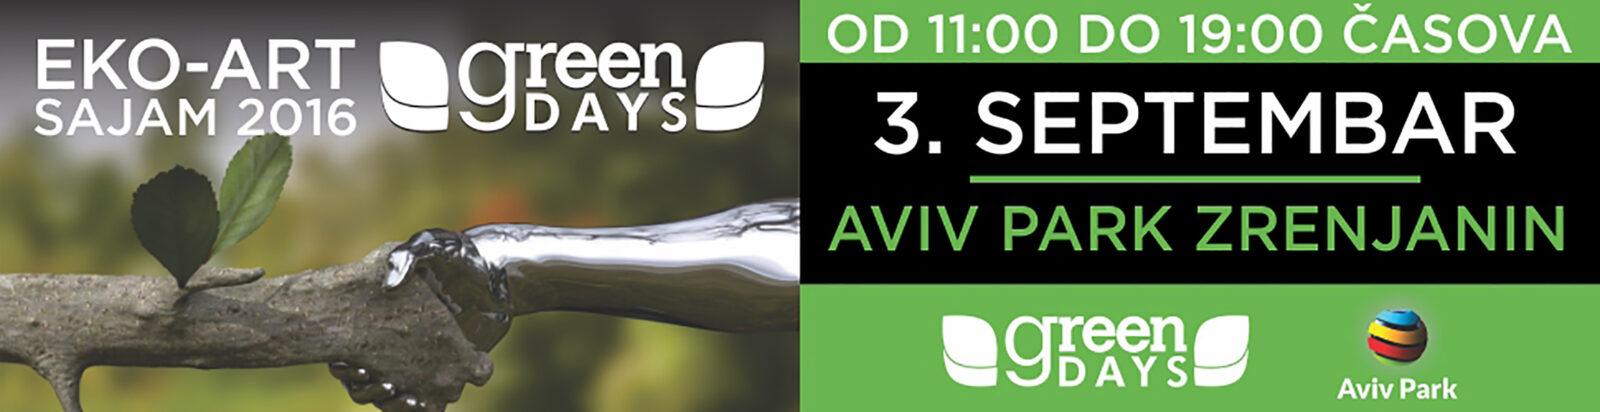 Green_Days-Portal-aviv park